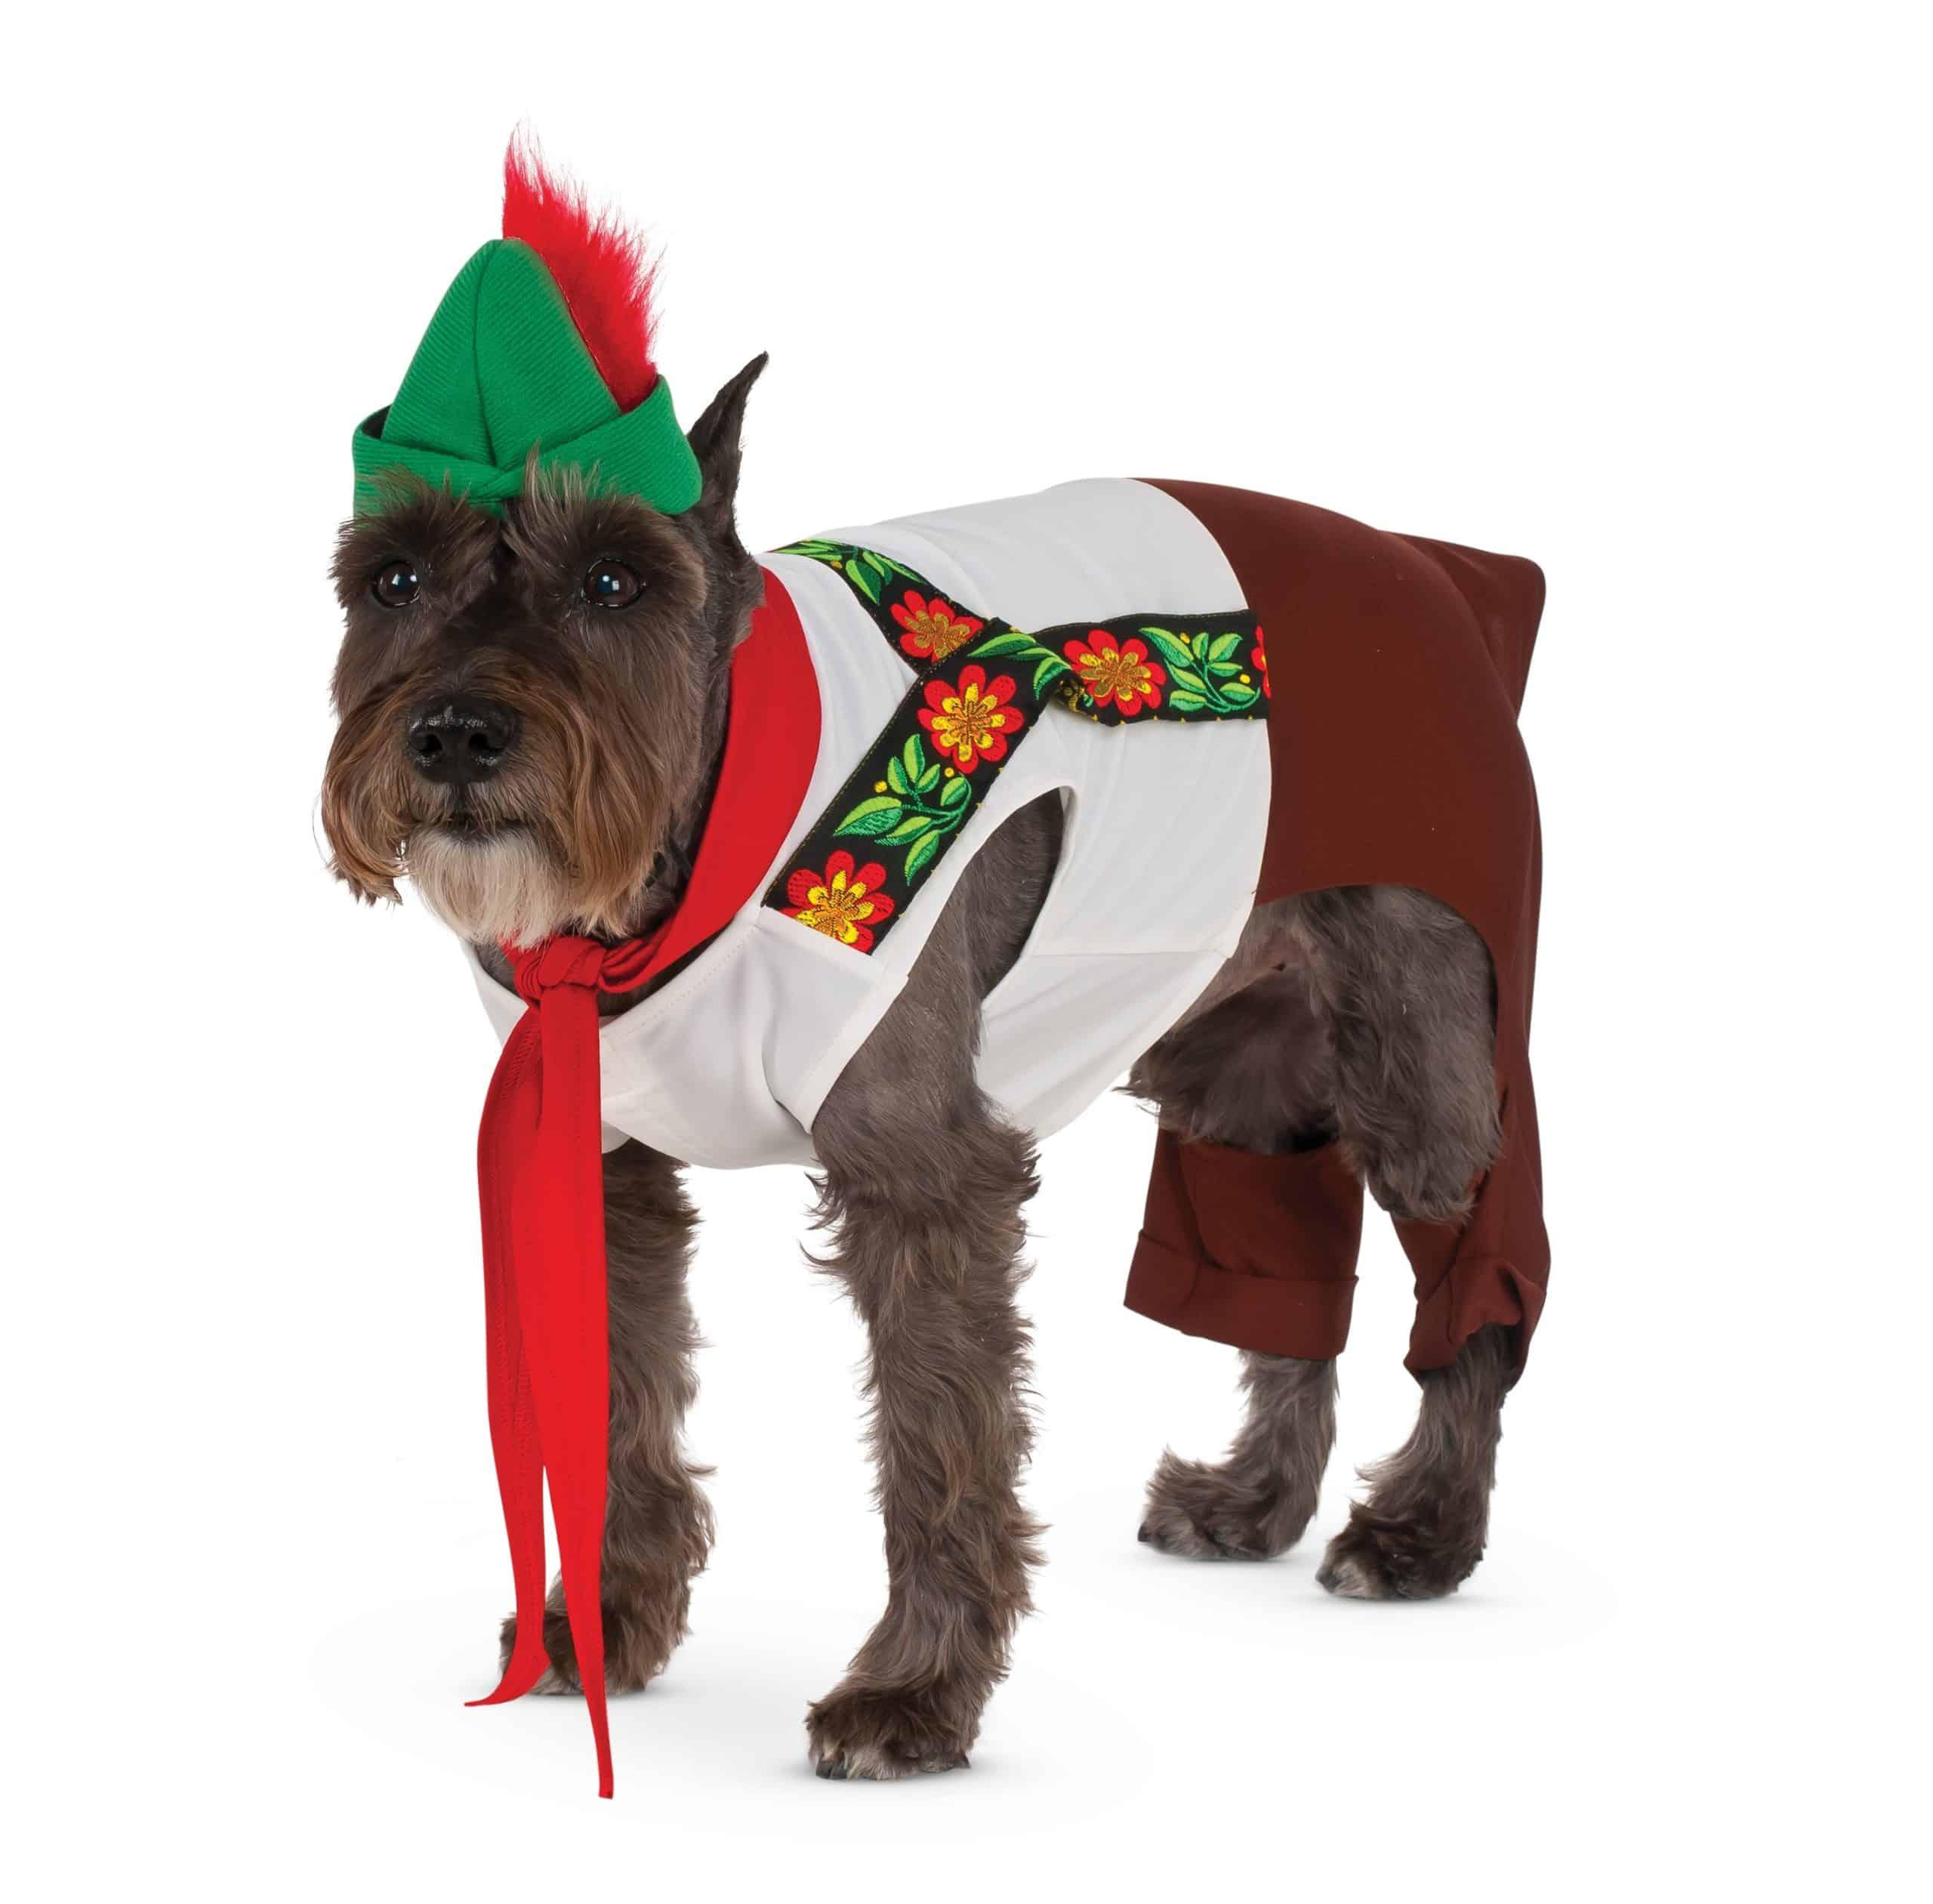 Lederhosen Hound Dog Costume